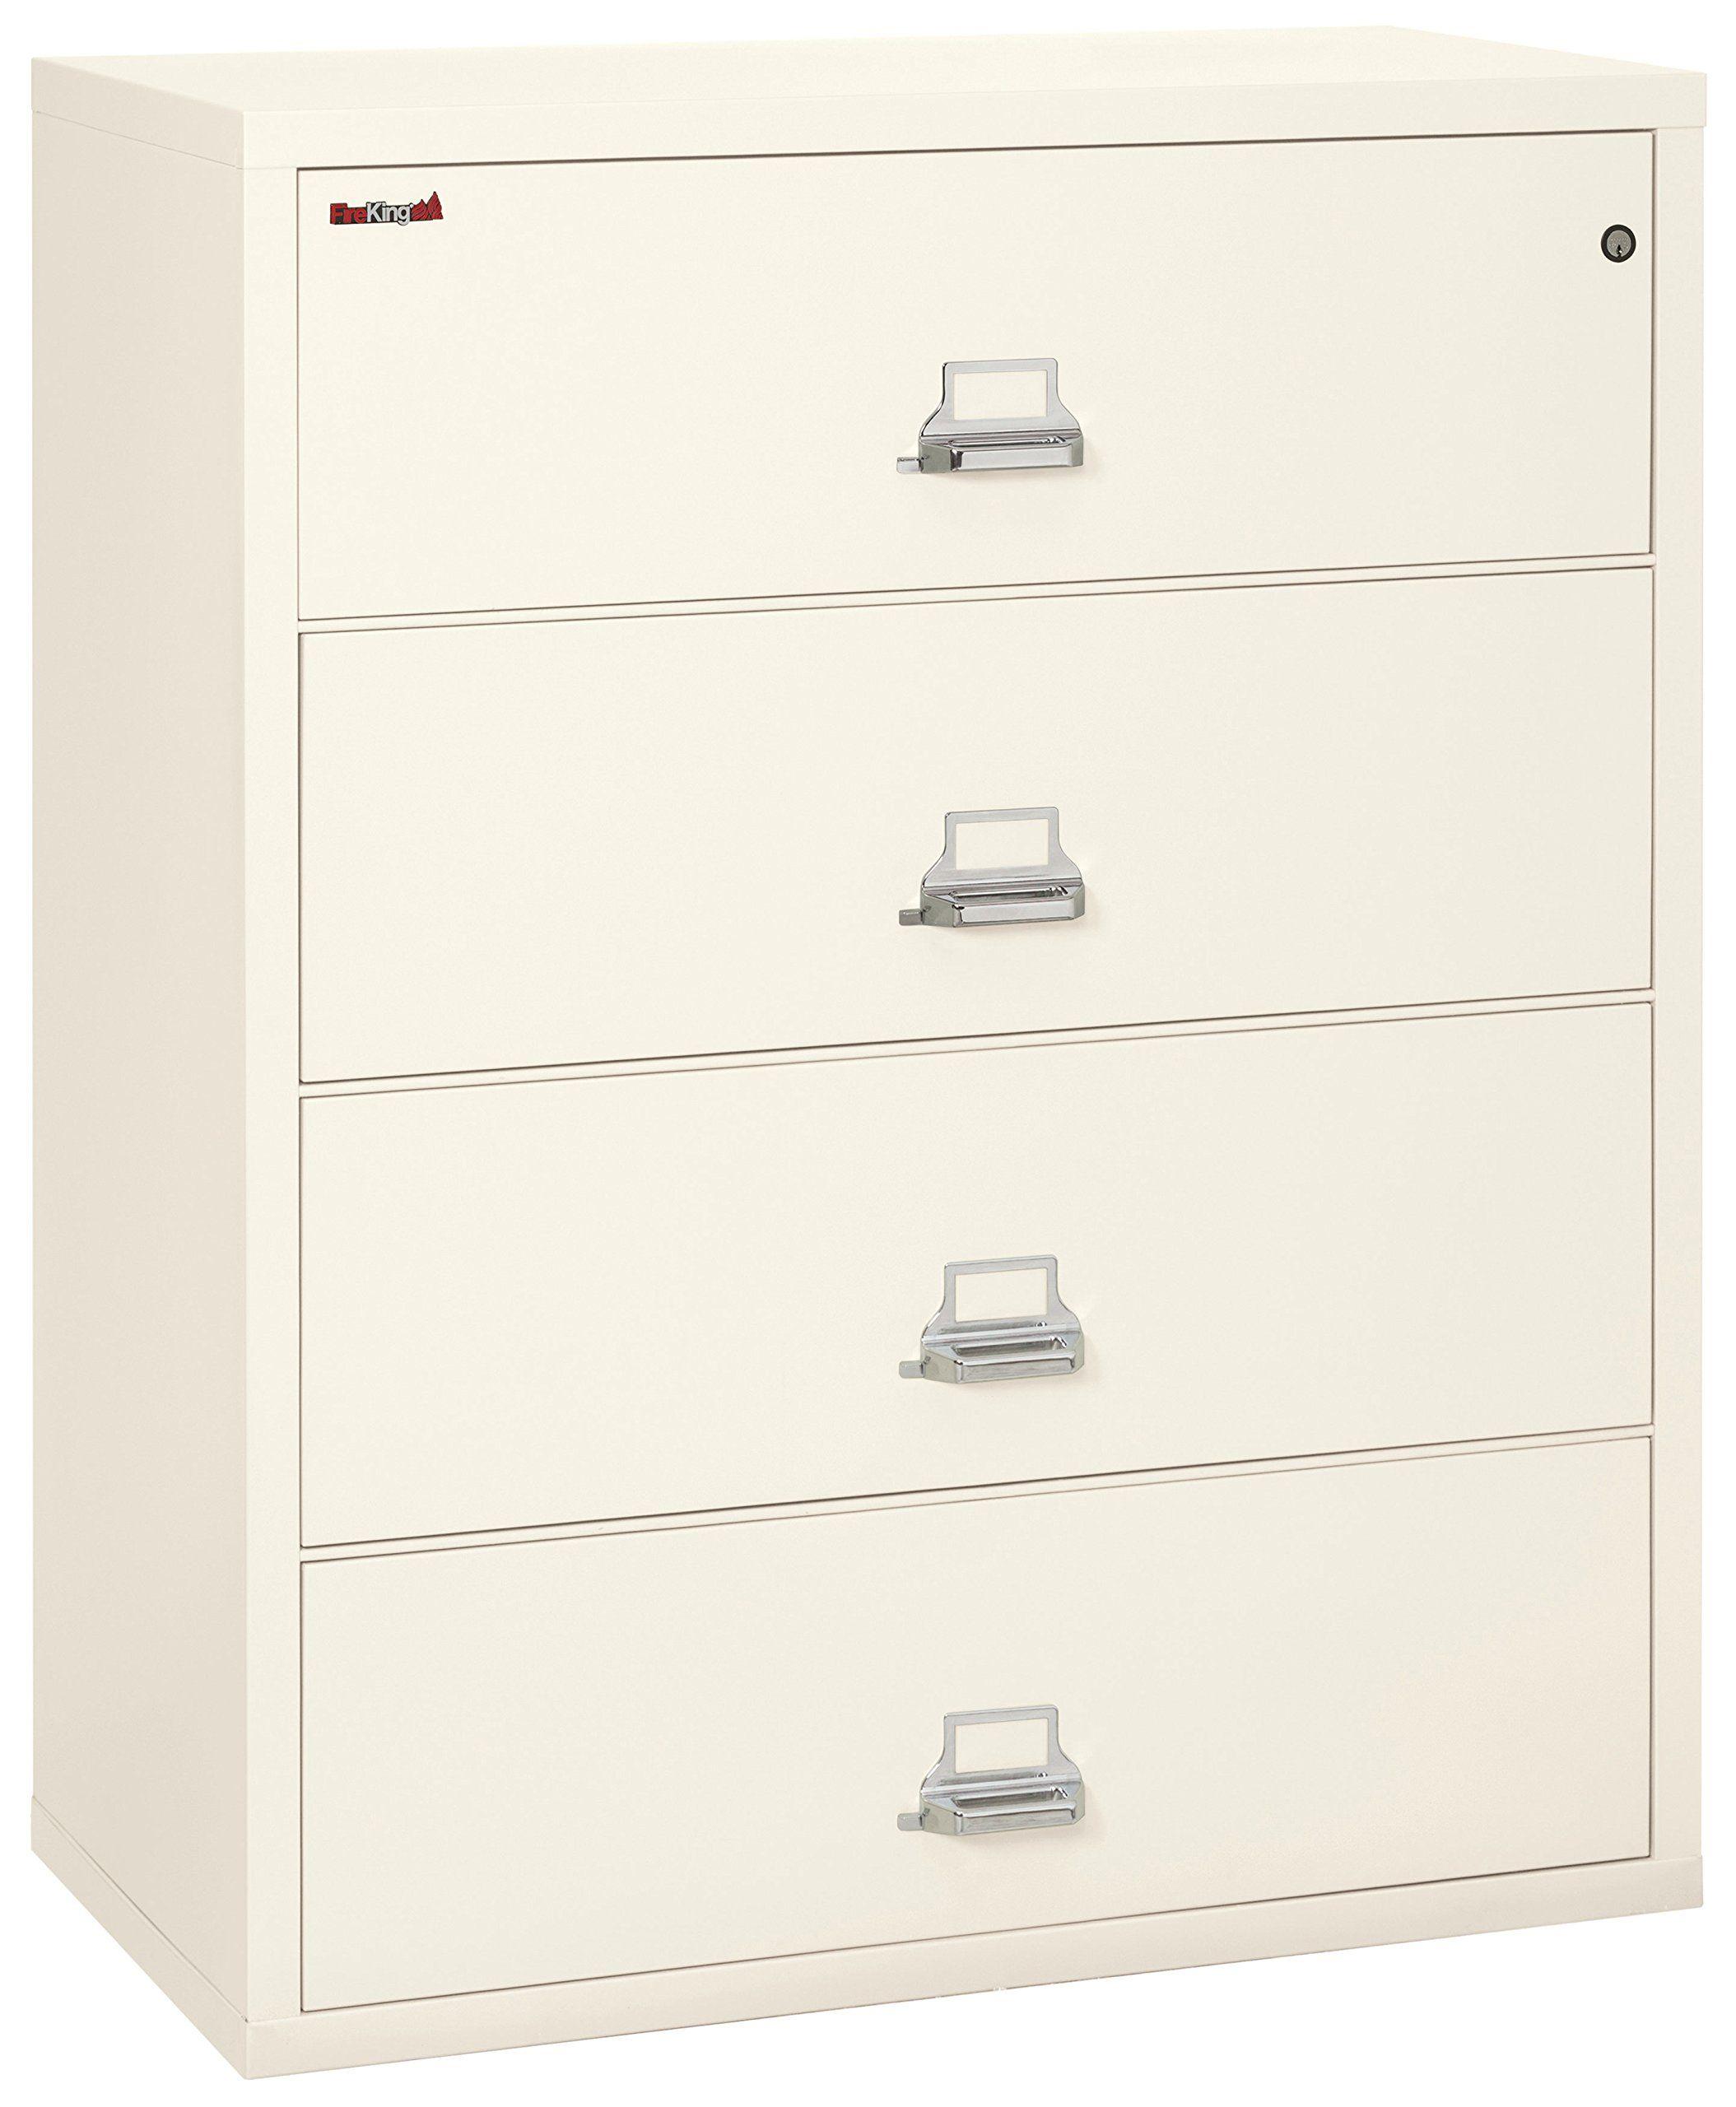 Fireking Fireproof Lateral File Cabinet 4 Drawers Impact Resistant Waterproof 44